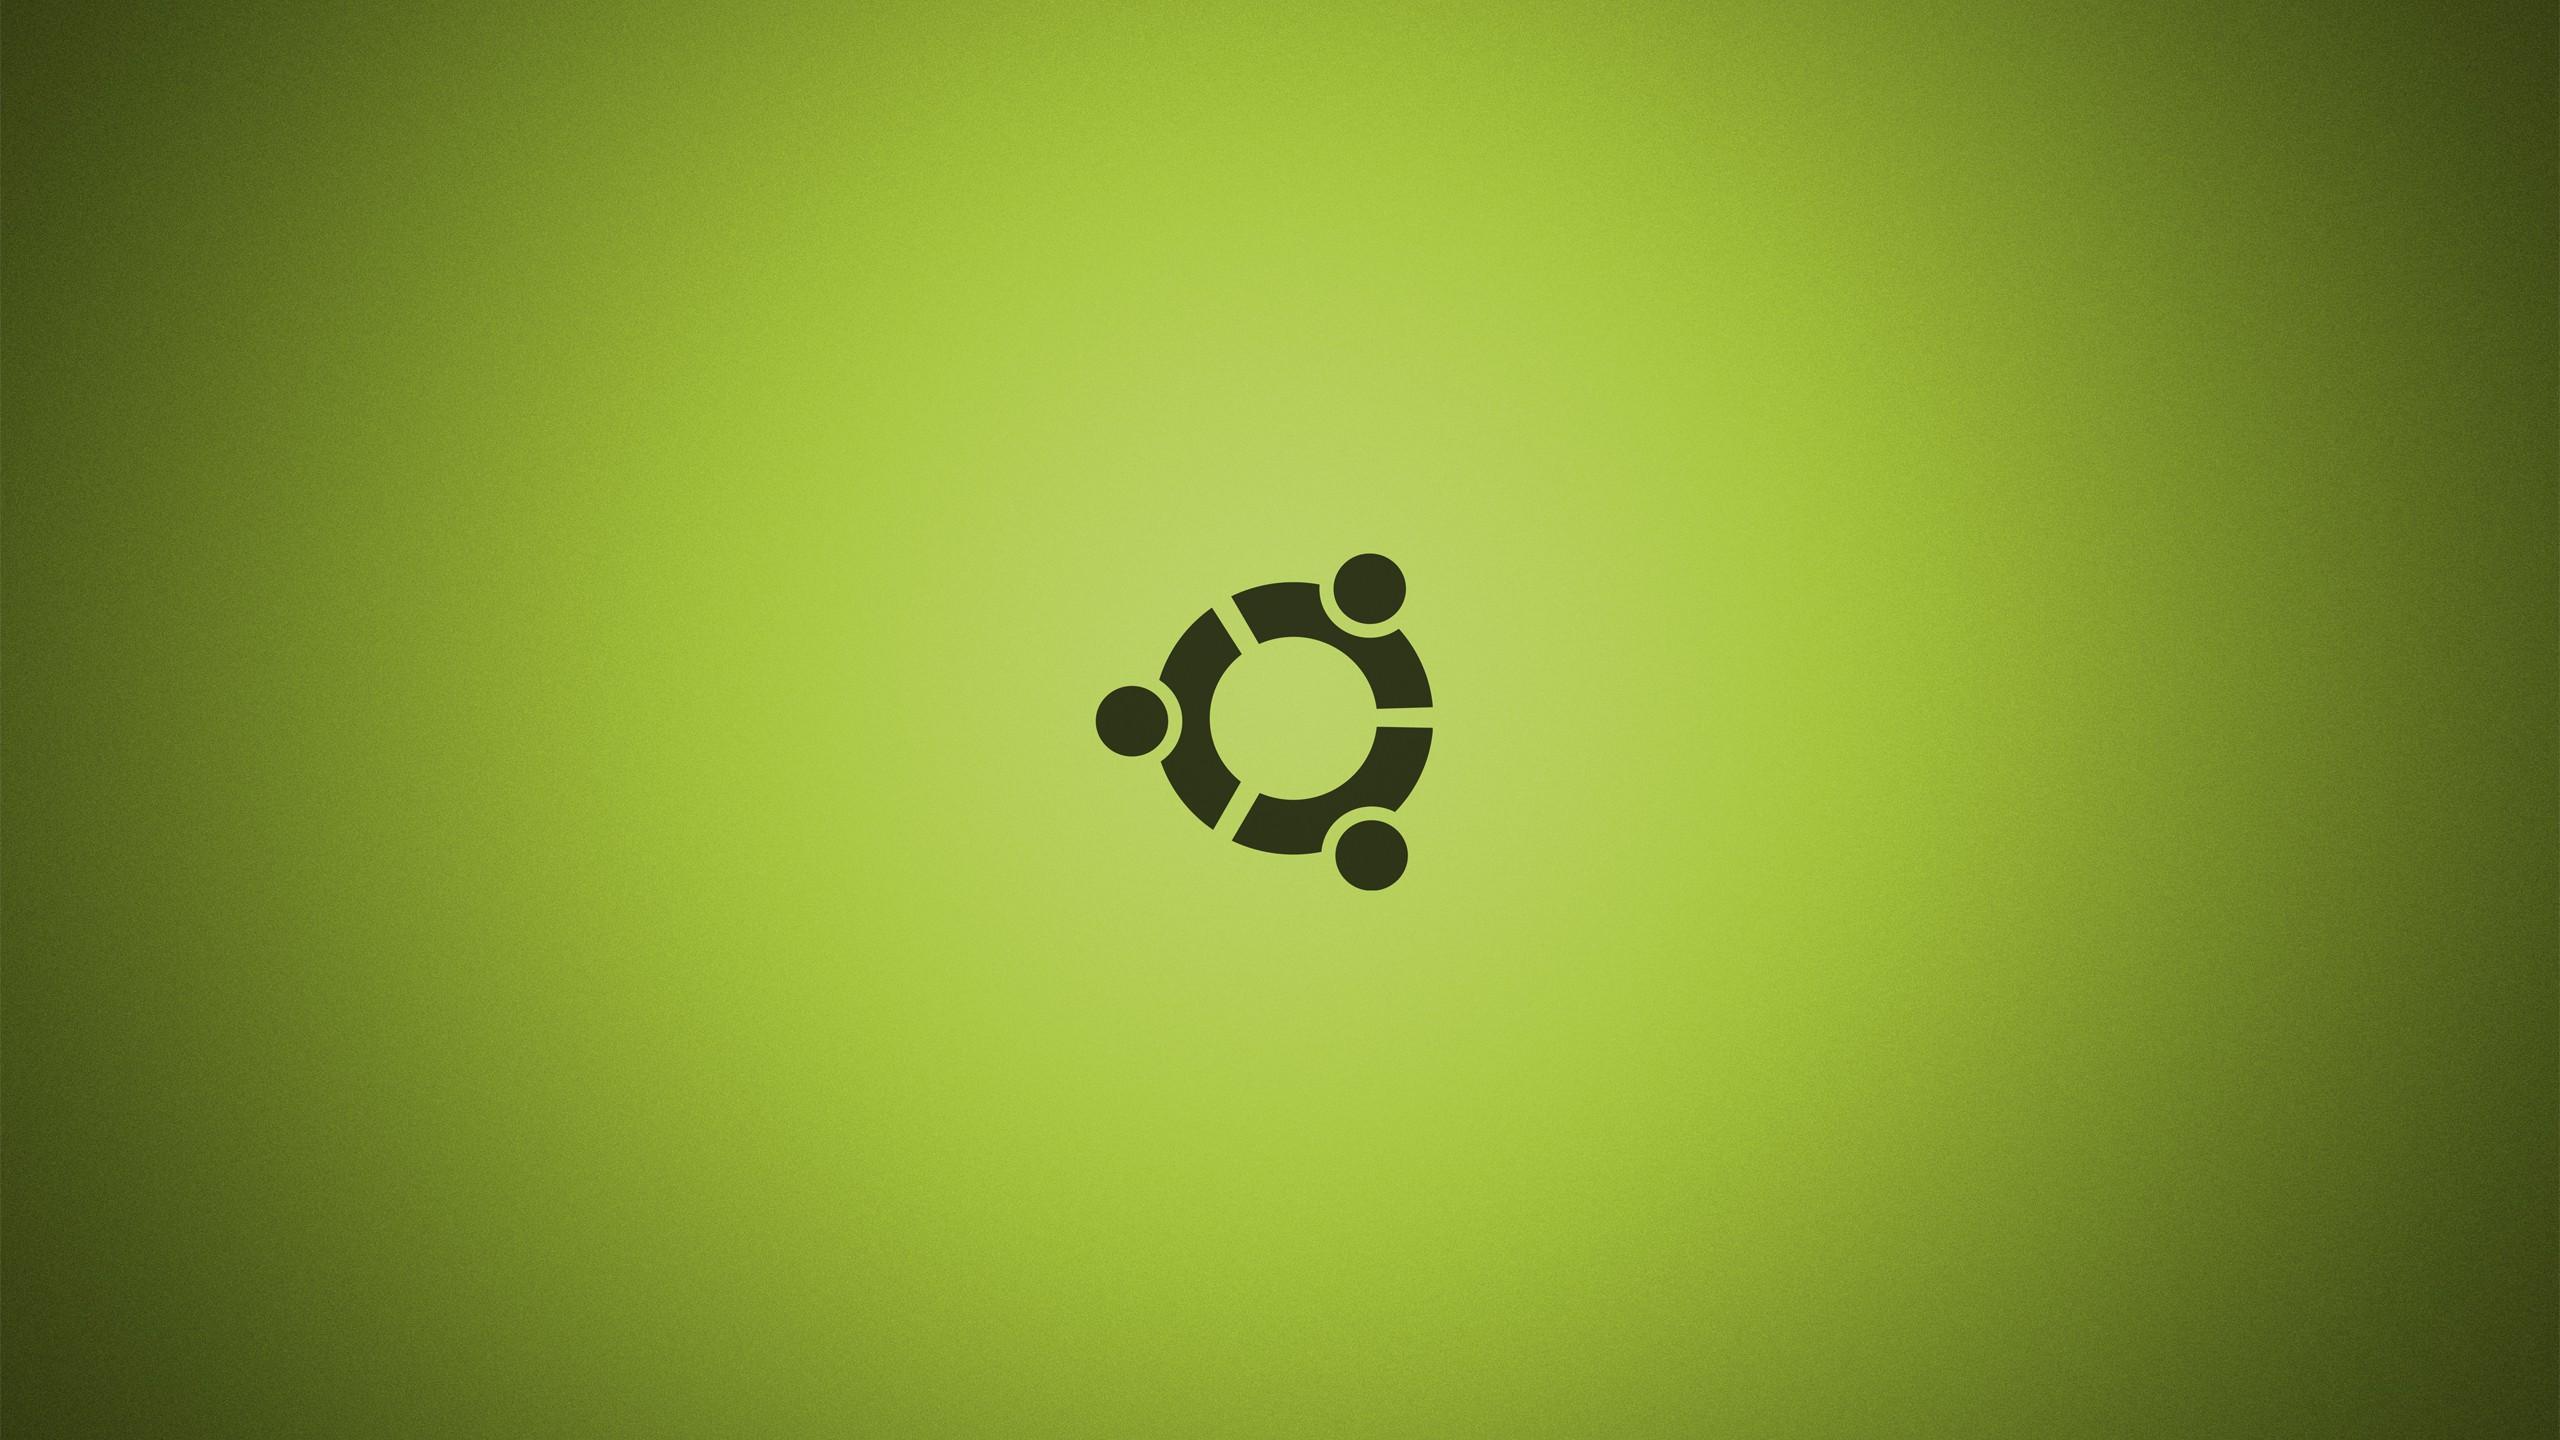 Green Ubuntu Wallpaper 40658 1920x1080 px